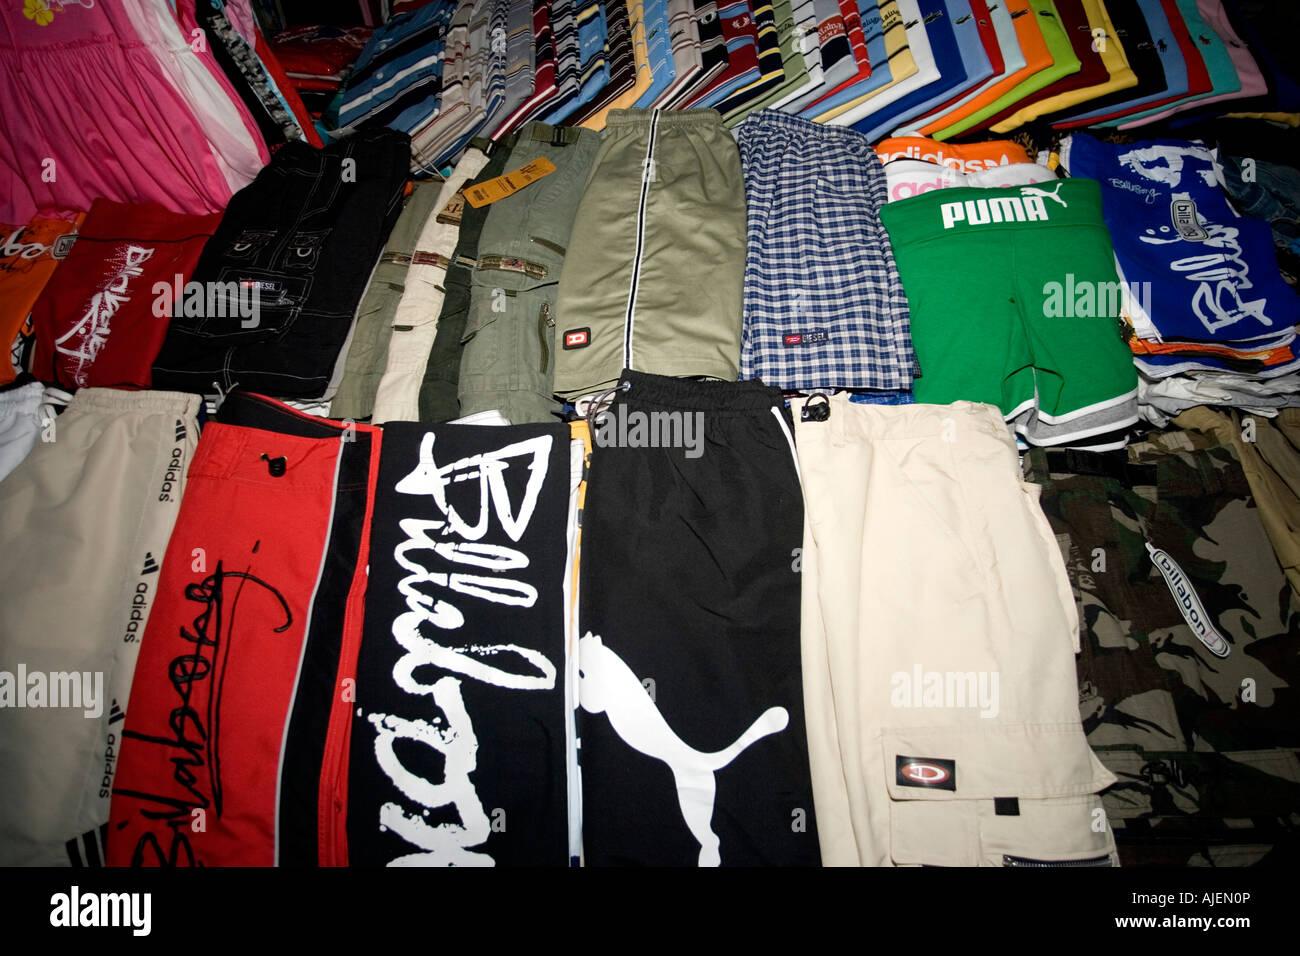 ropa adidas barata tailandia